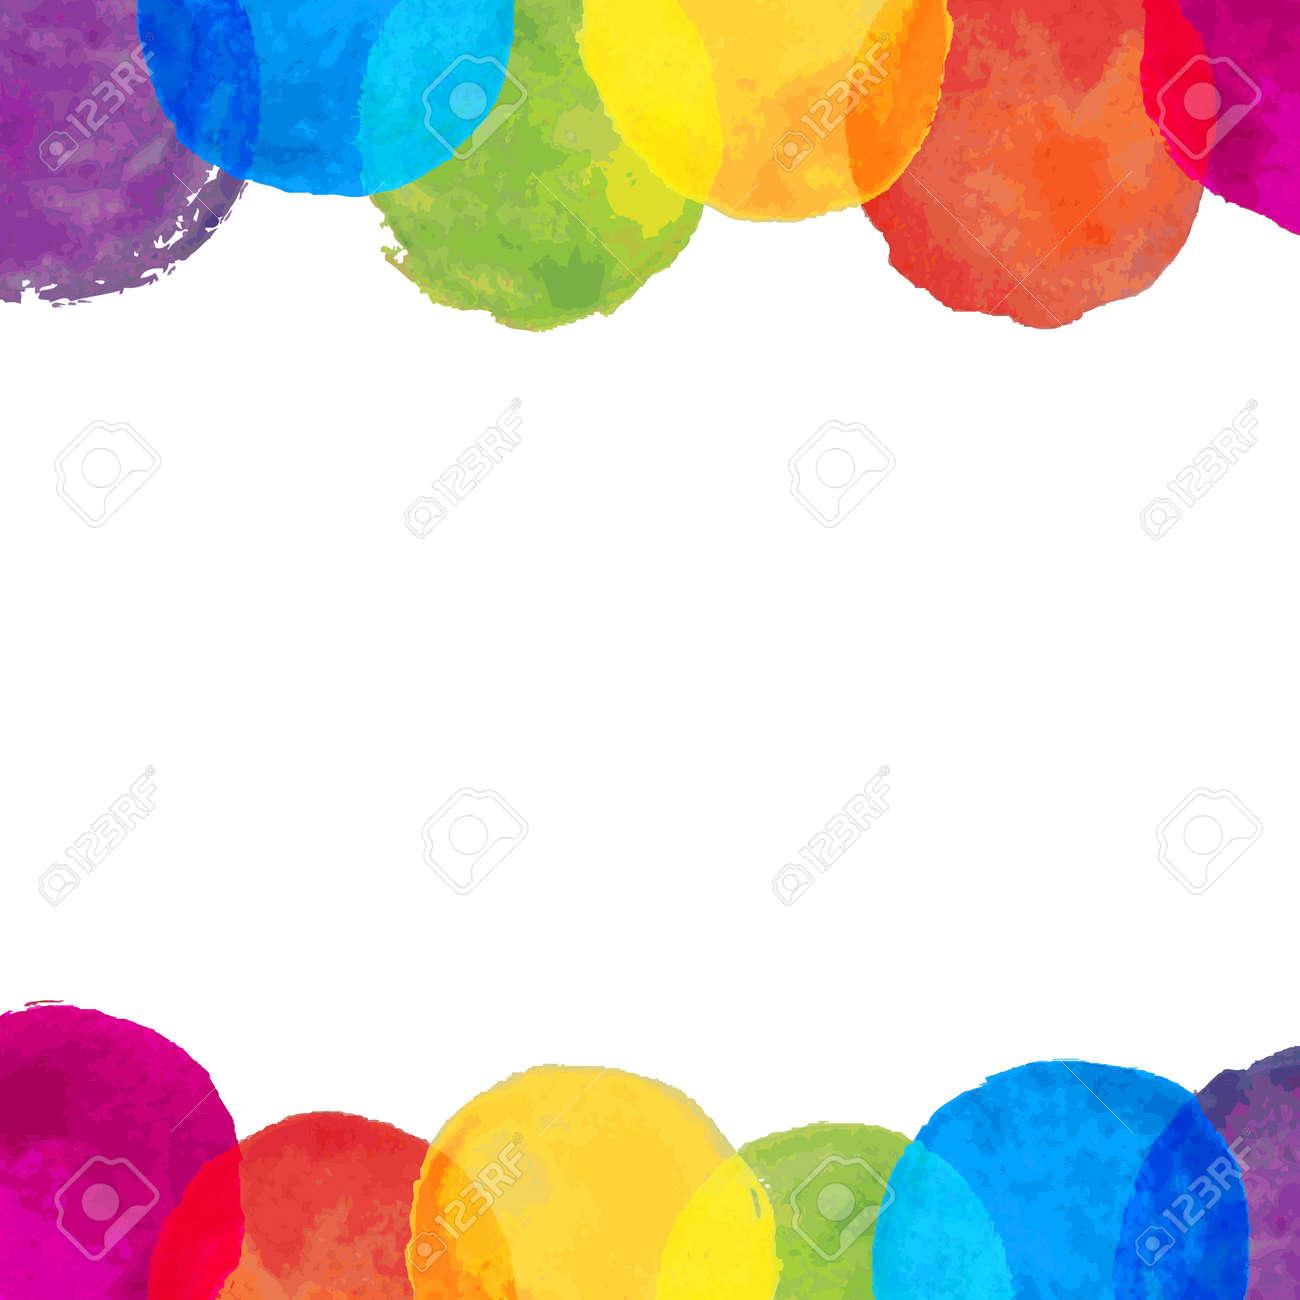 Watercolor Blot Frame Illustration - 28871607